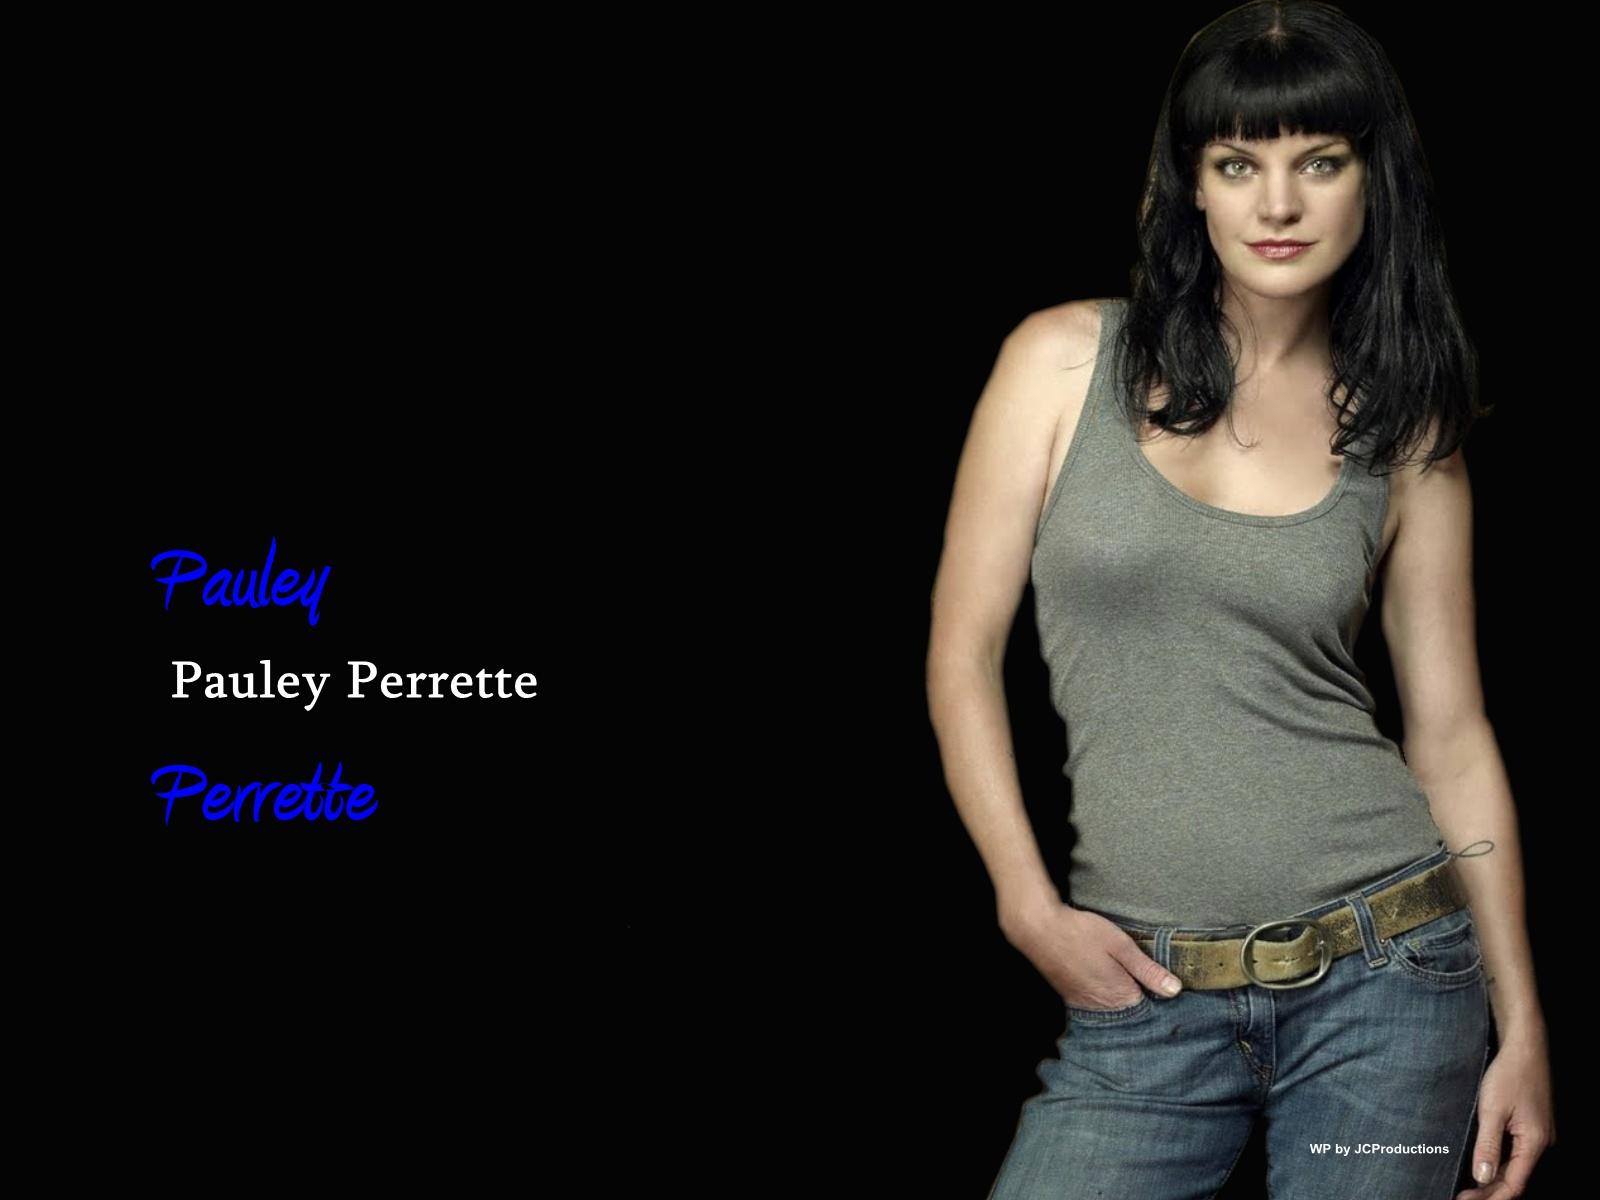 NCIS Abby Sciuto aka Pauley Perrette